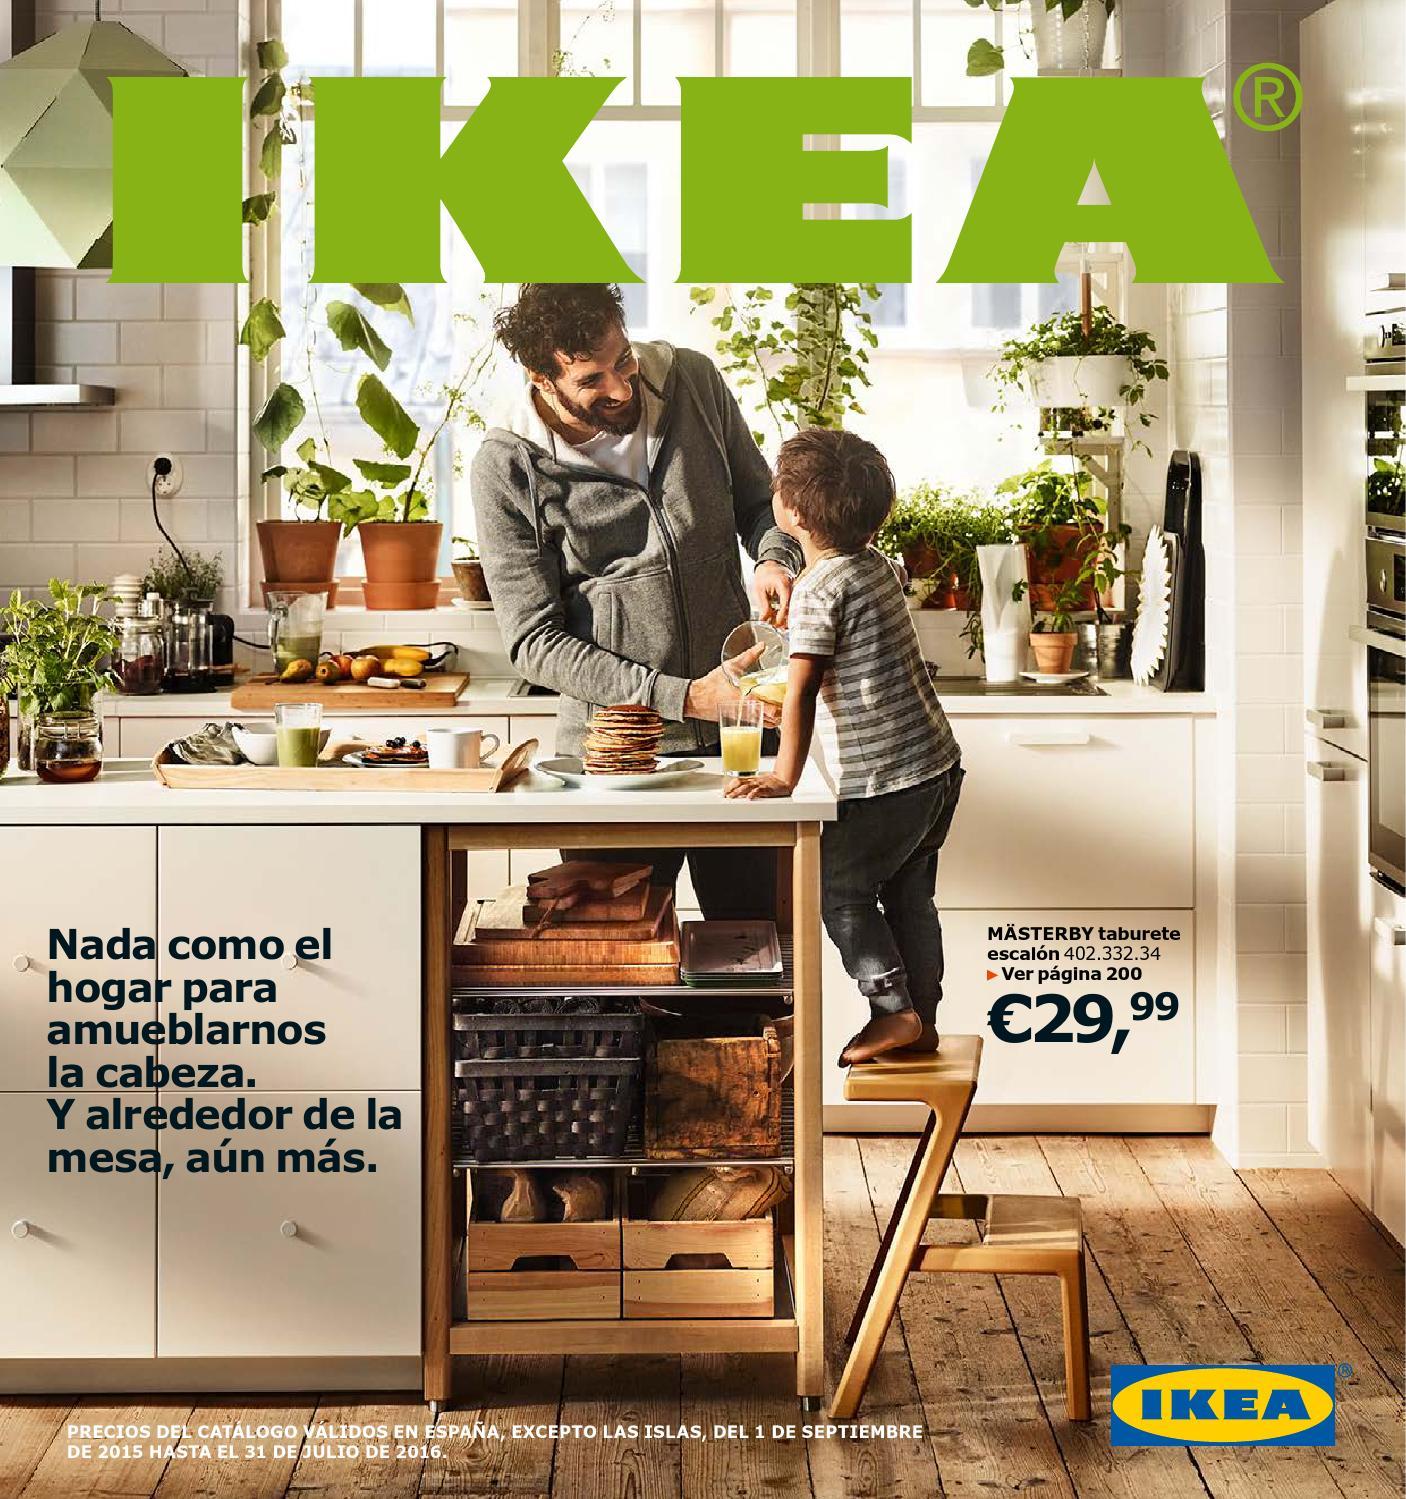 IKEA - Catalogo 2016 by miguelator - issuu